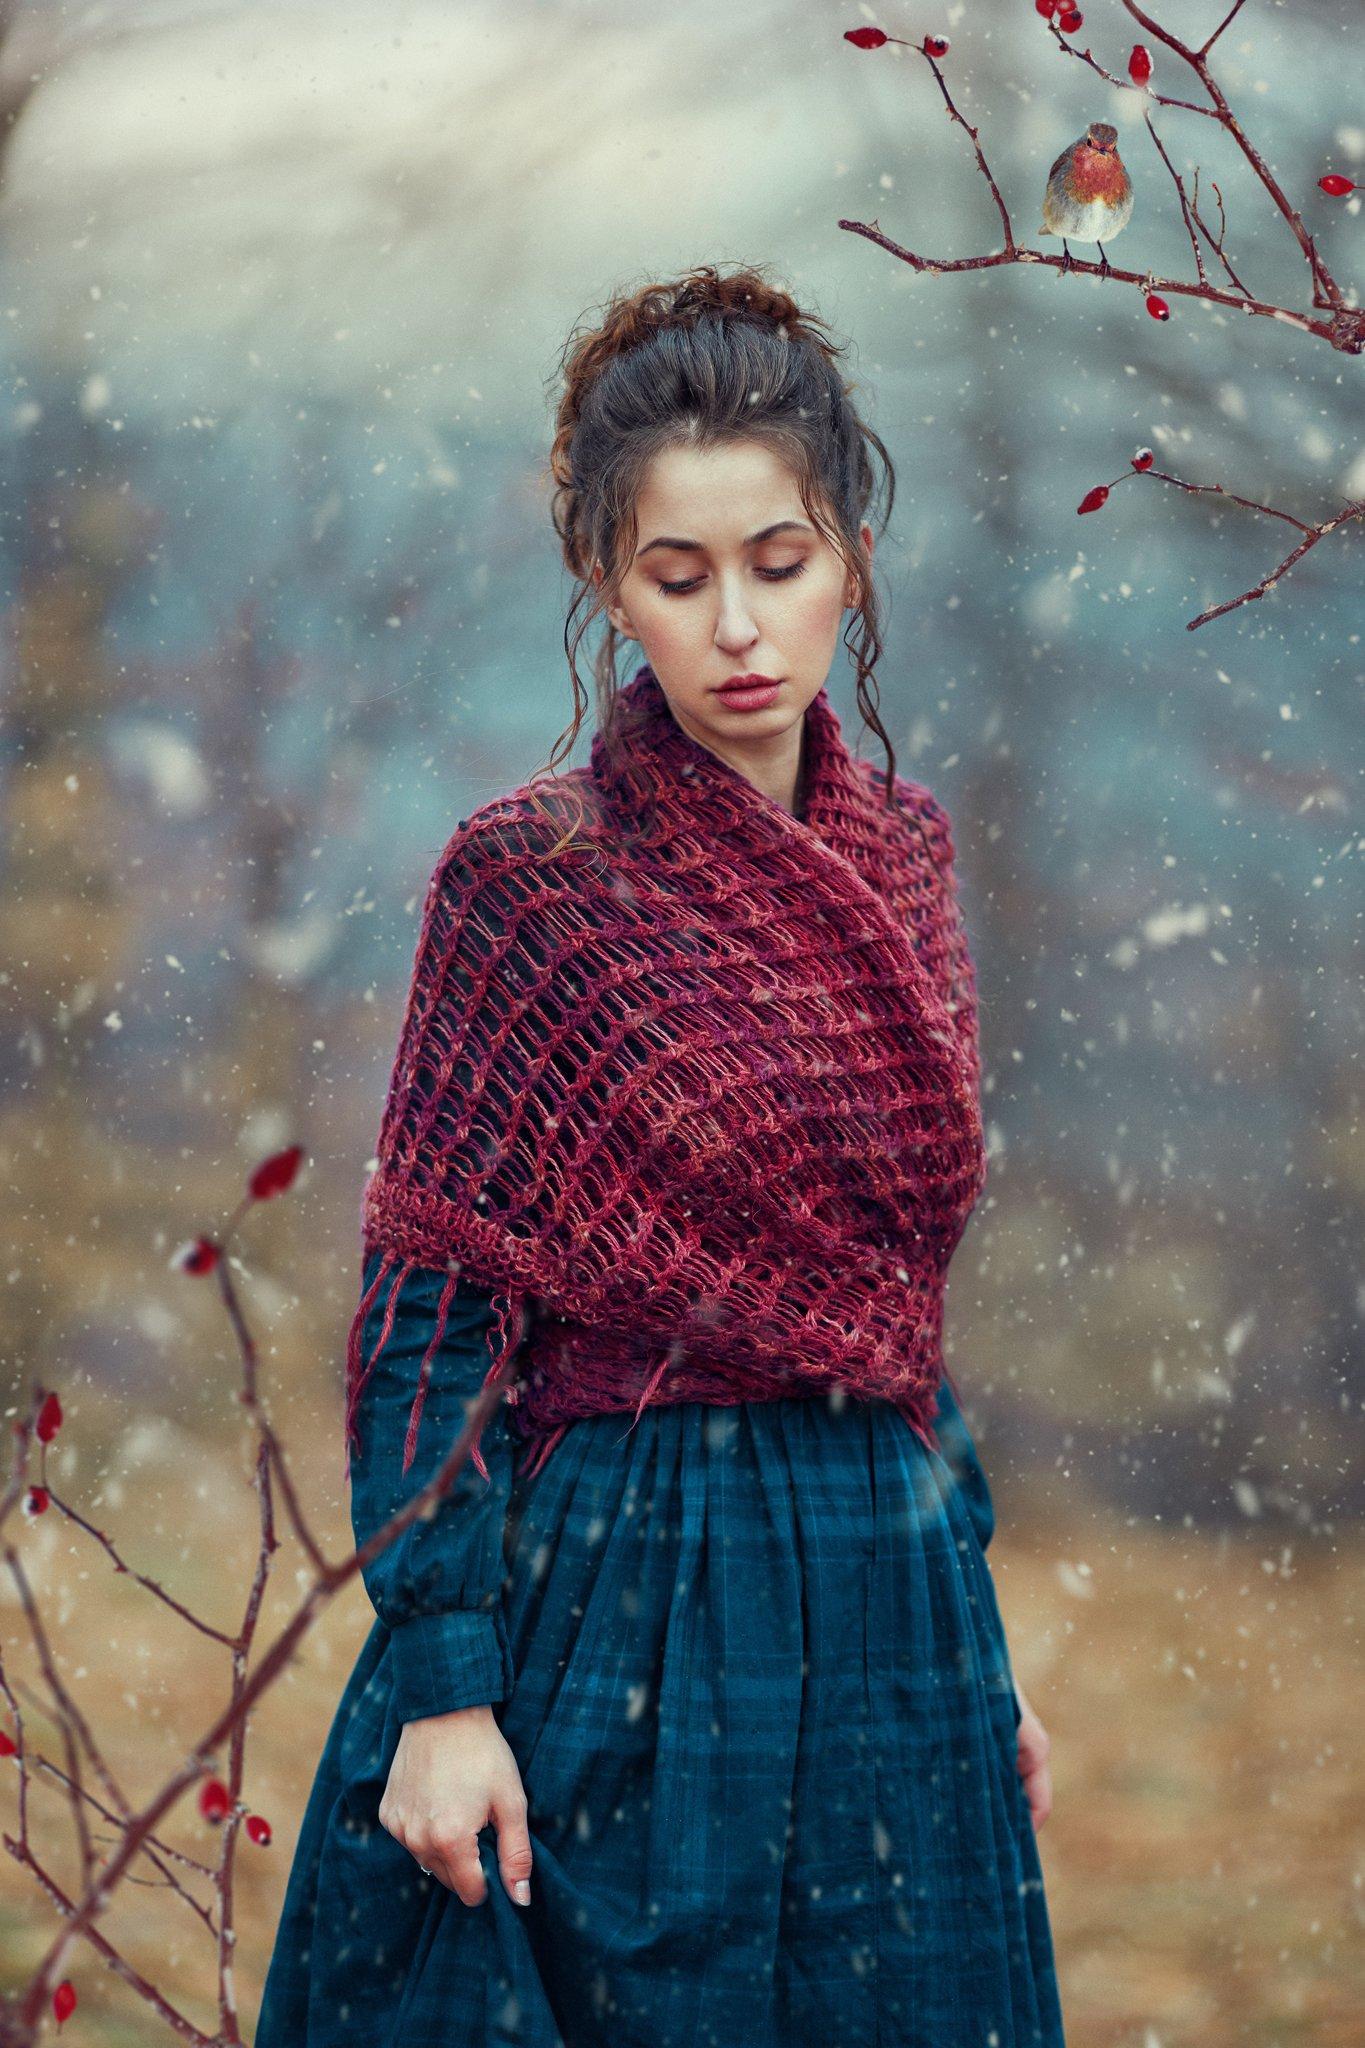 woman, winter, bird, snow, Monica Lazar